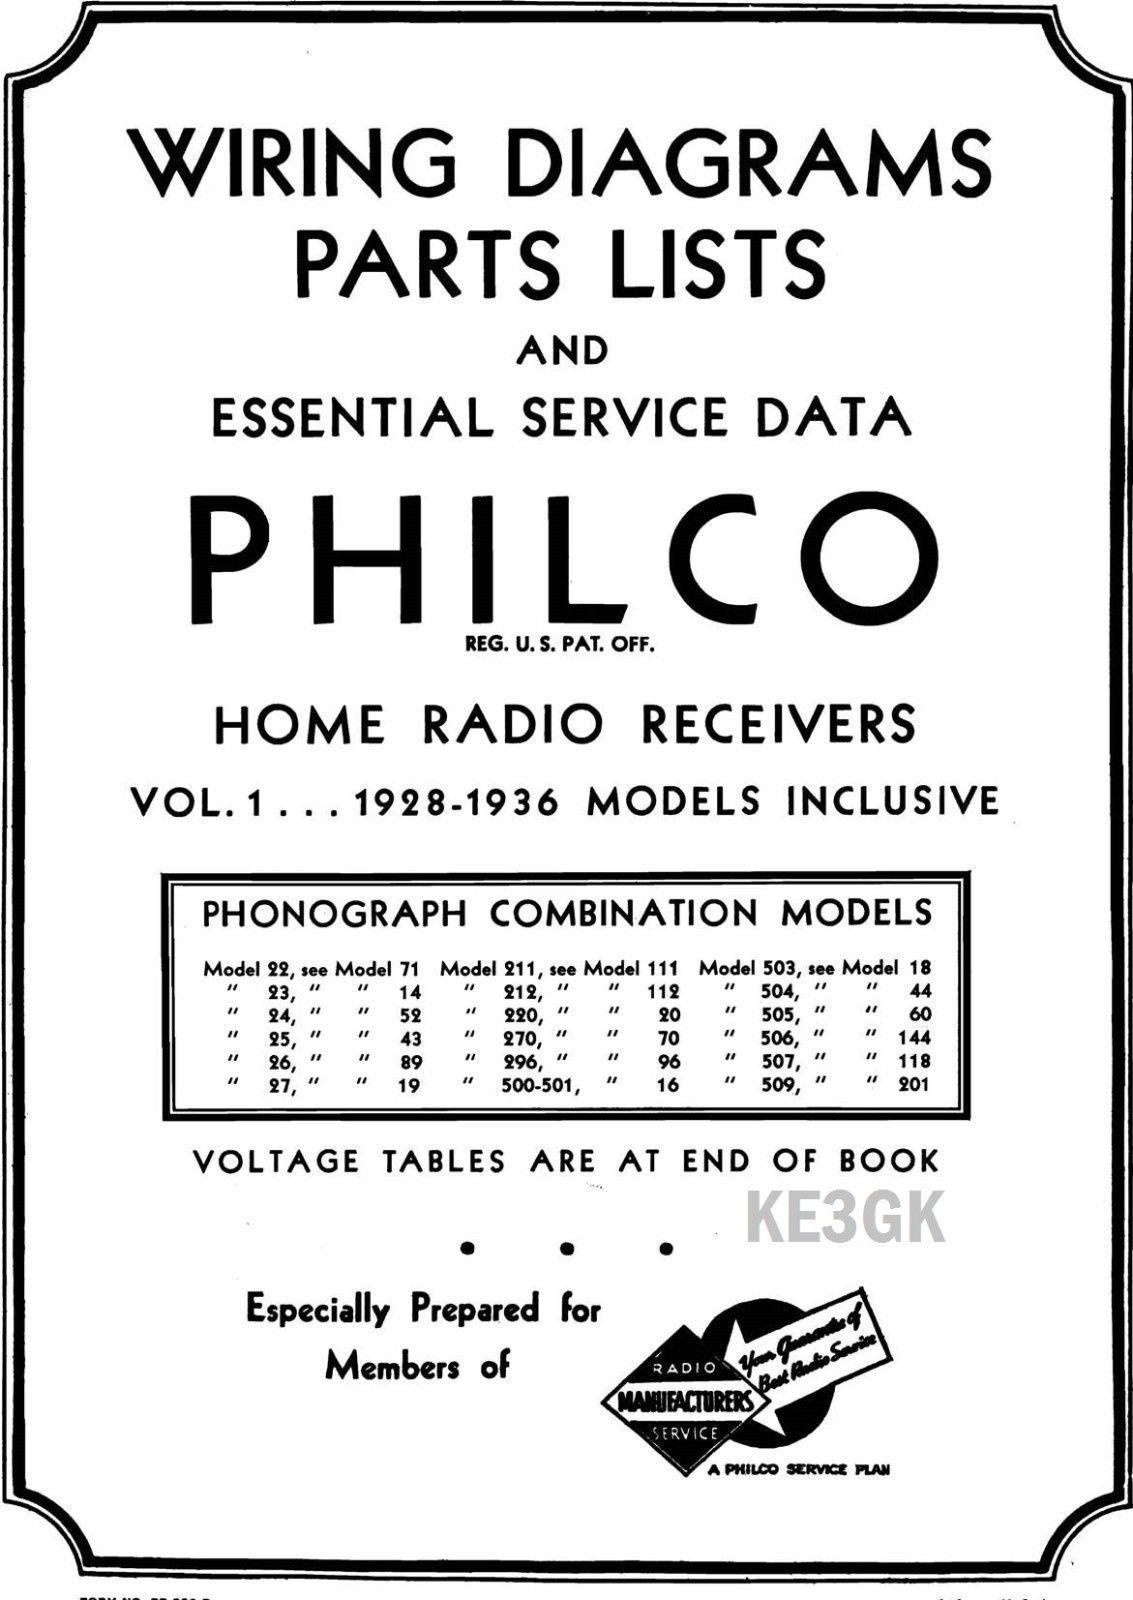 Philco Wiring Diagrams and Parts List 1928 - 1938 * PDF * CDROM